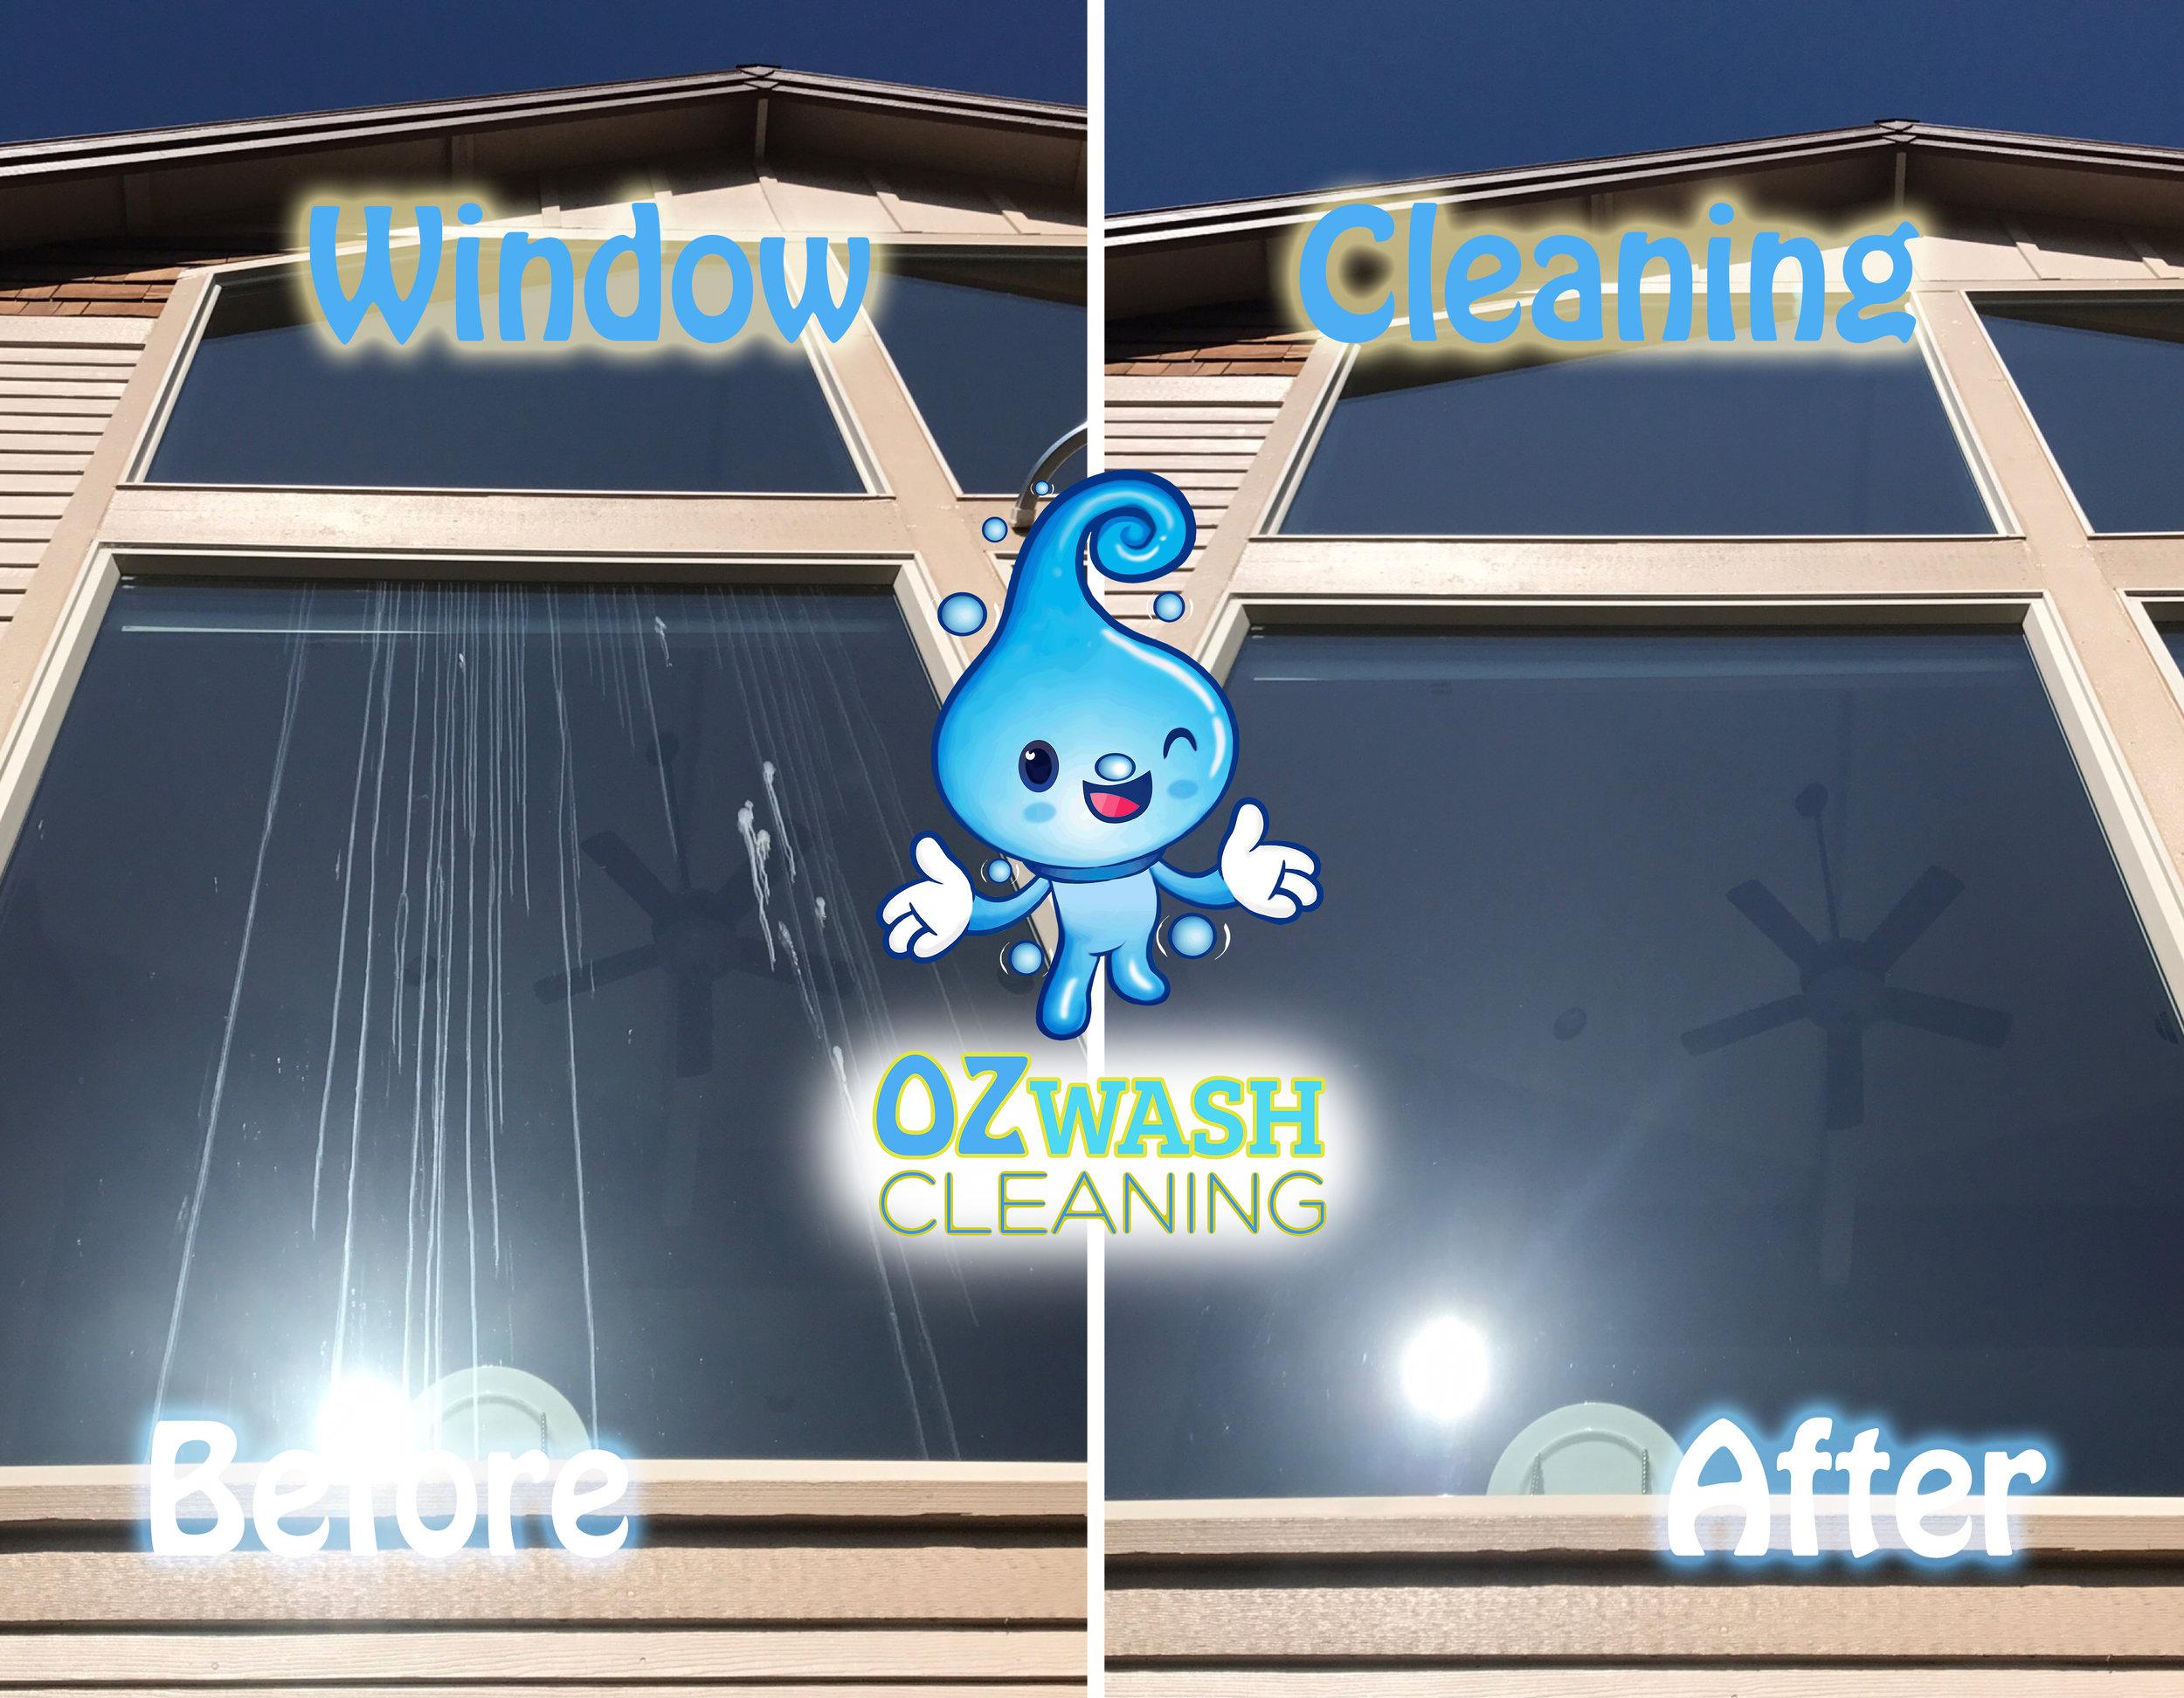 WindowCleaning12.jpg